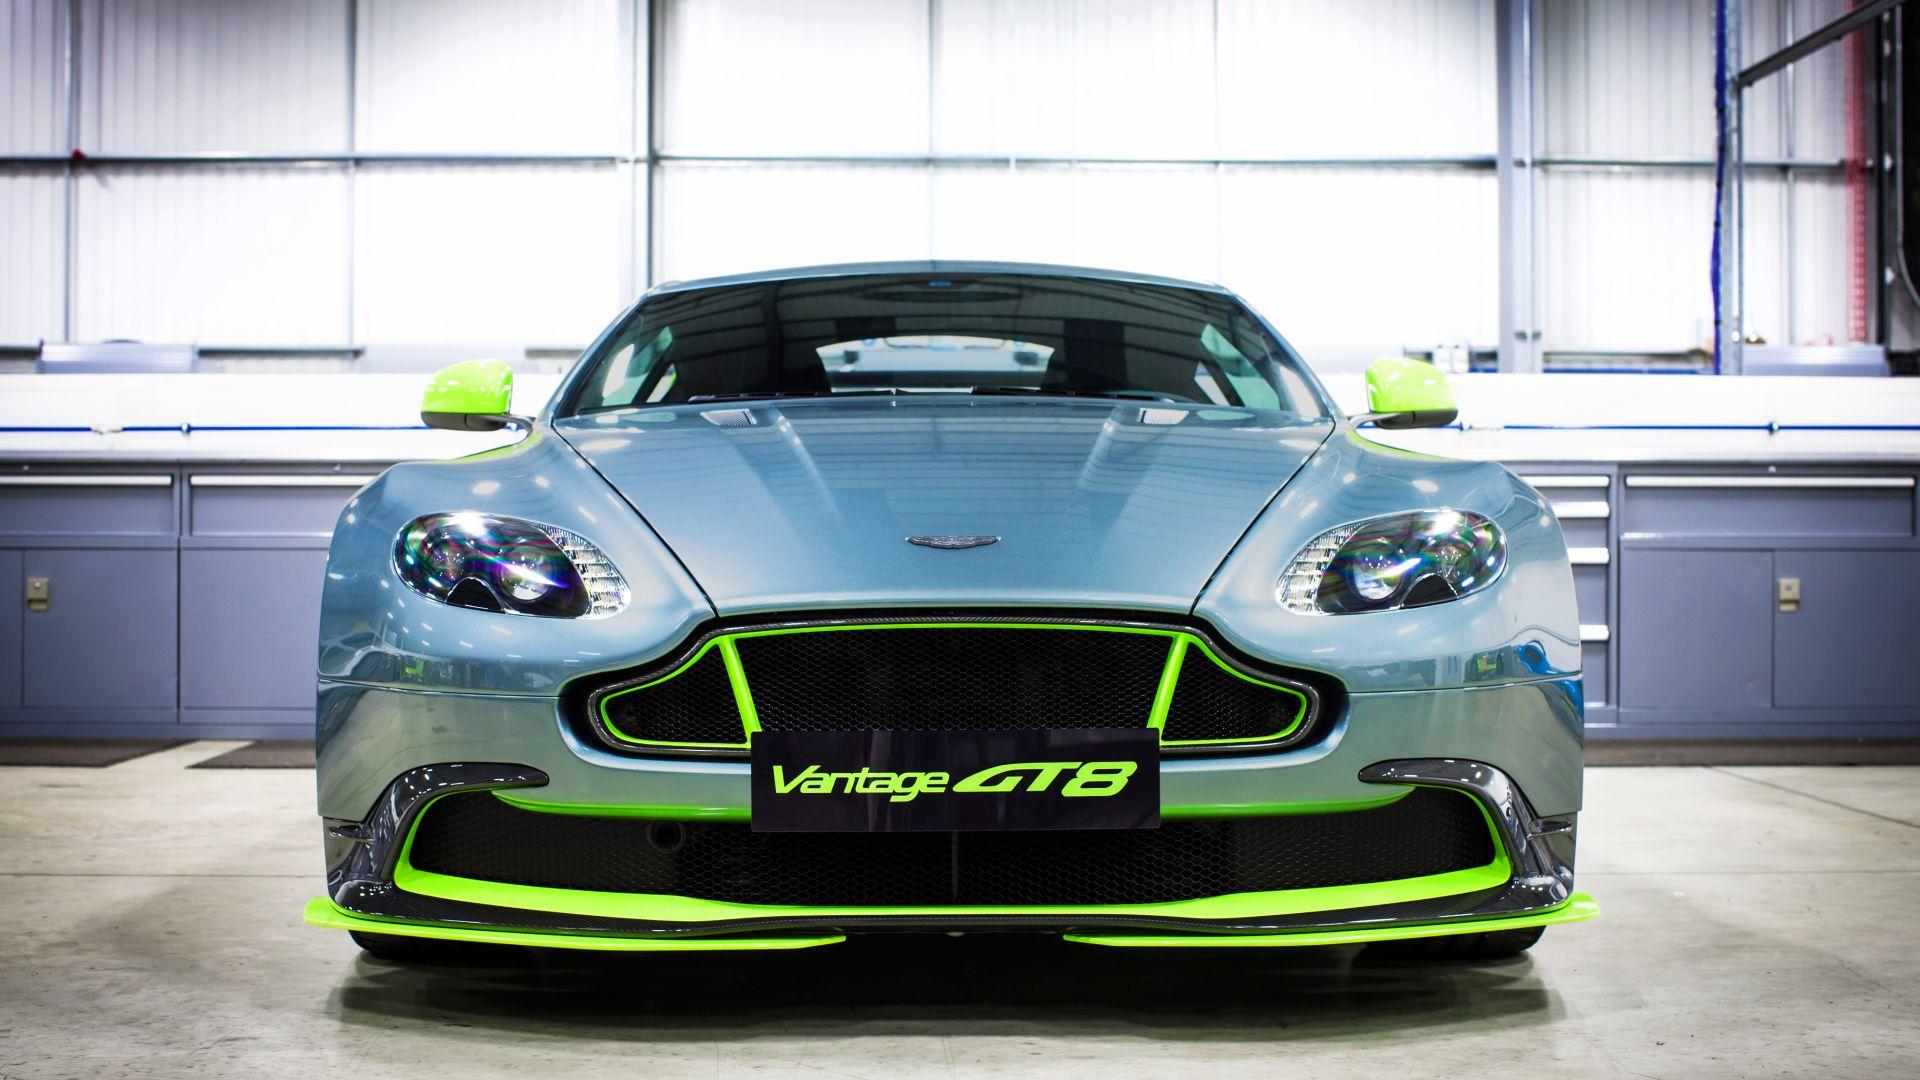 Aston Martin Wraps up Another Fabulous Festival of Speed © Aston Martin Lagonda Limited